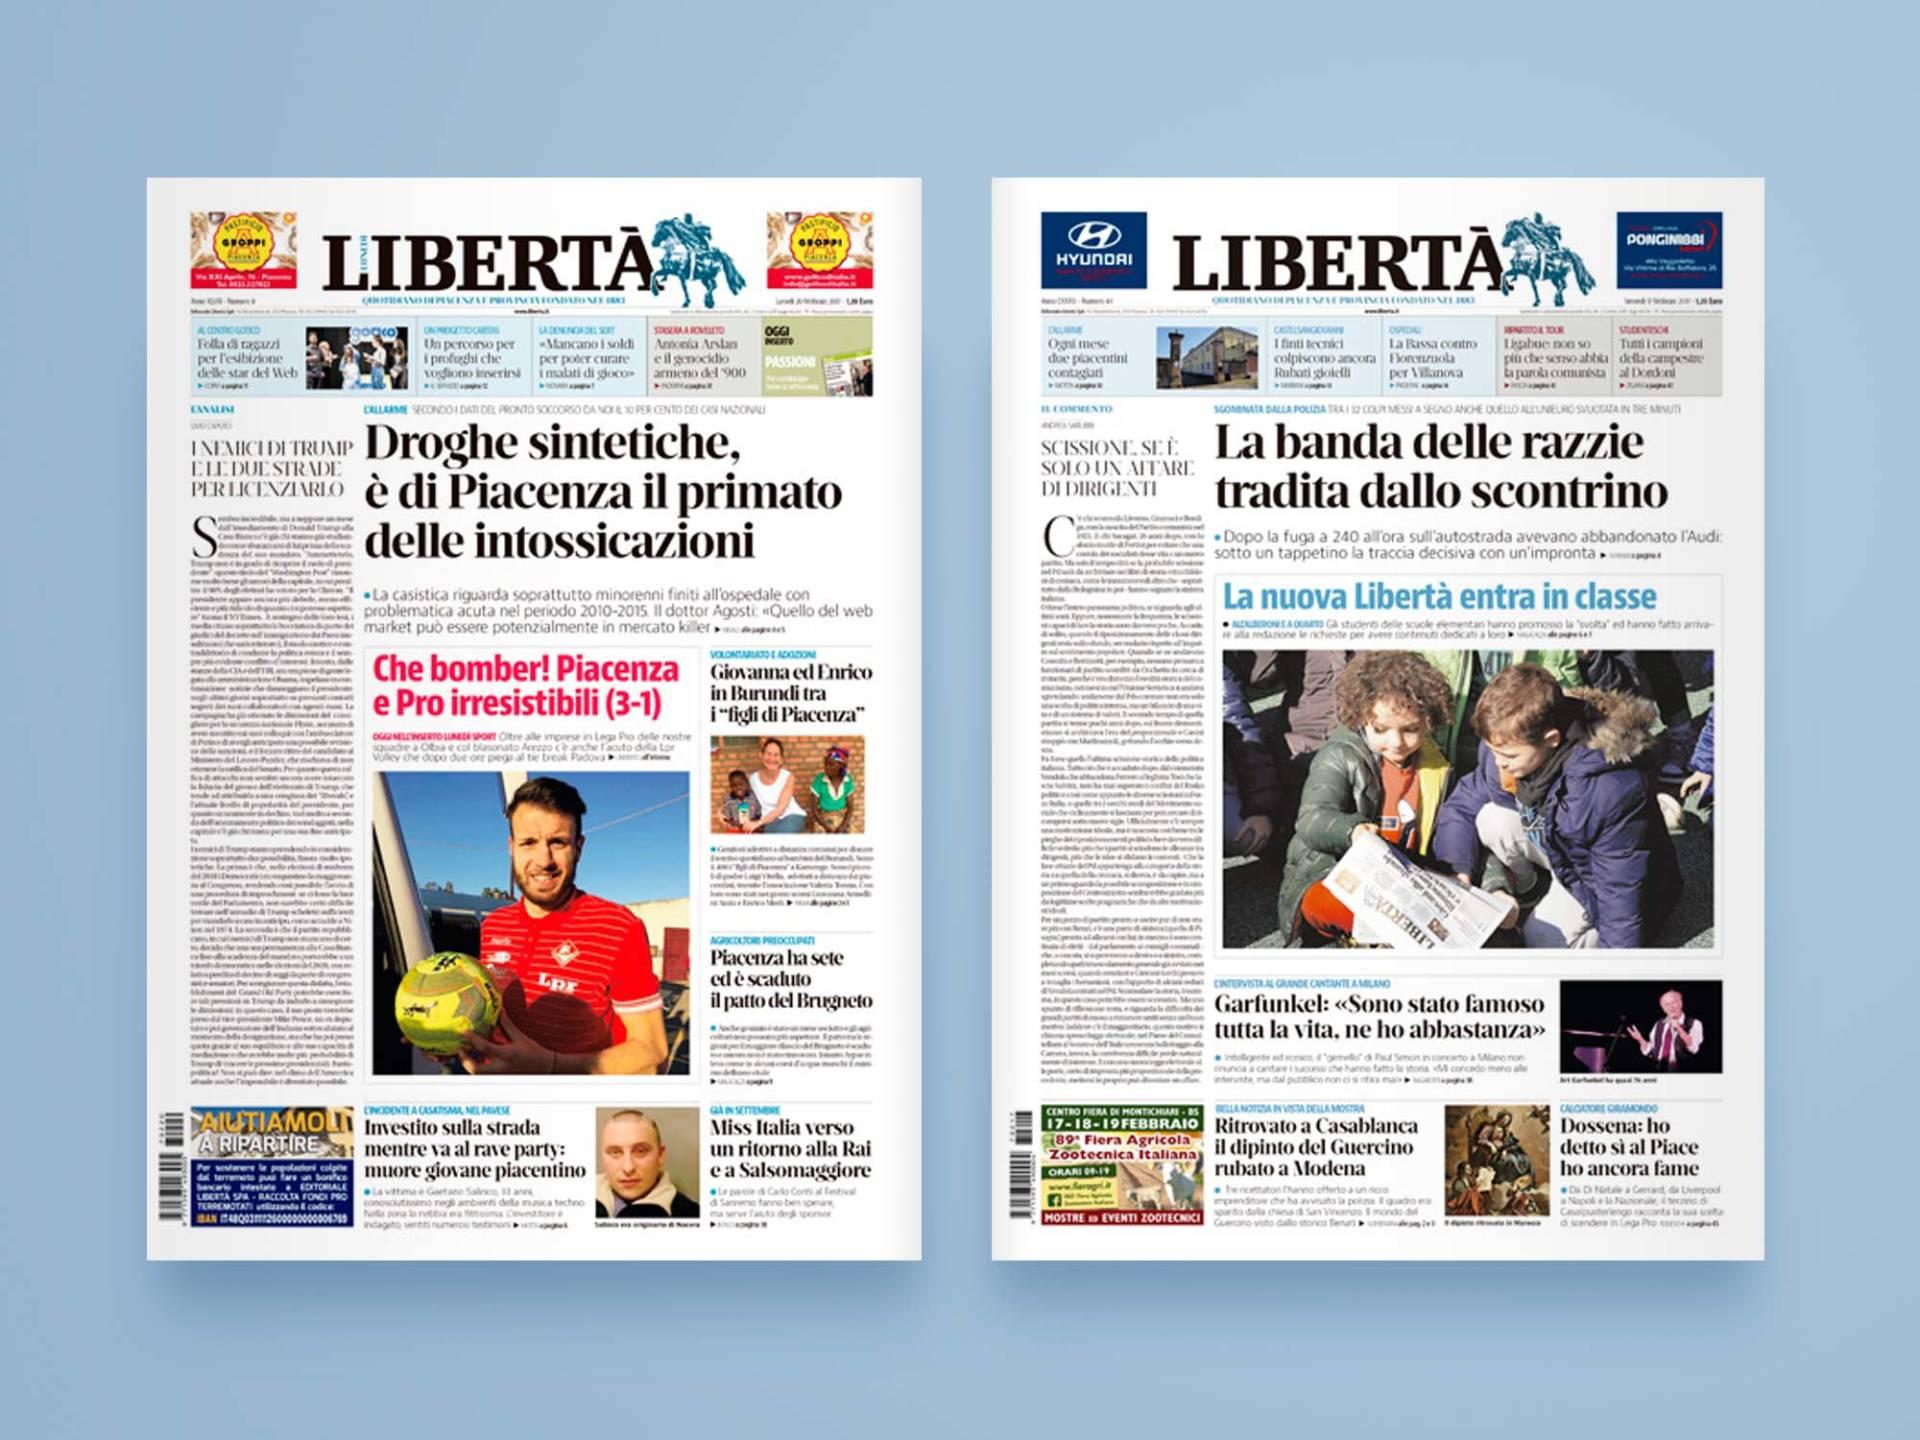 Liberta_13_Wenceslau_News_Design